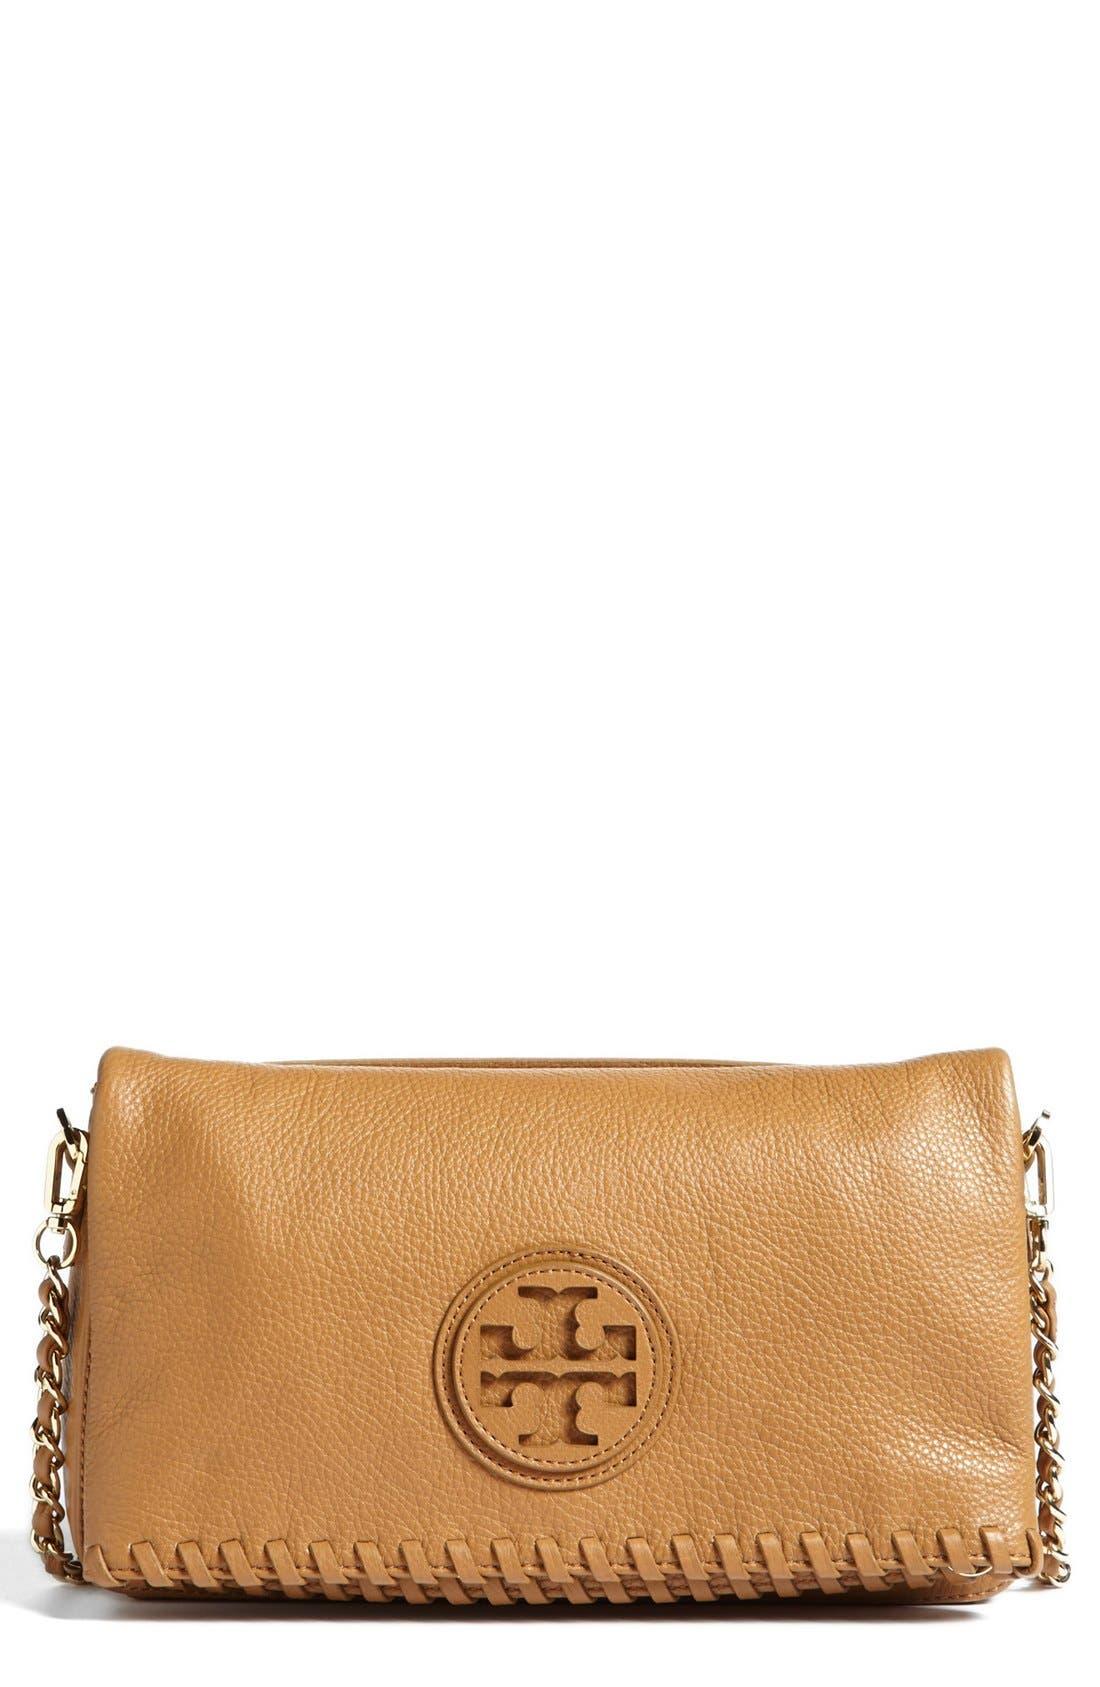 Main Image - Tory Burch 'Marion' Foldover Crossbody Bag